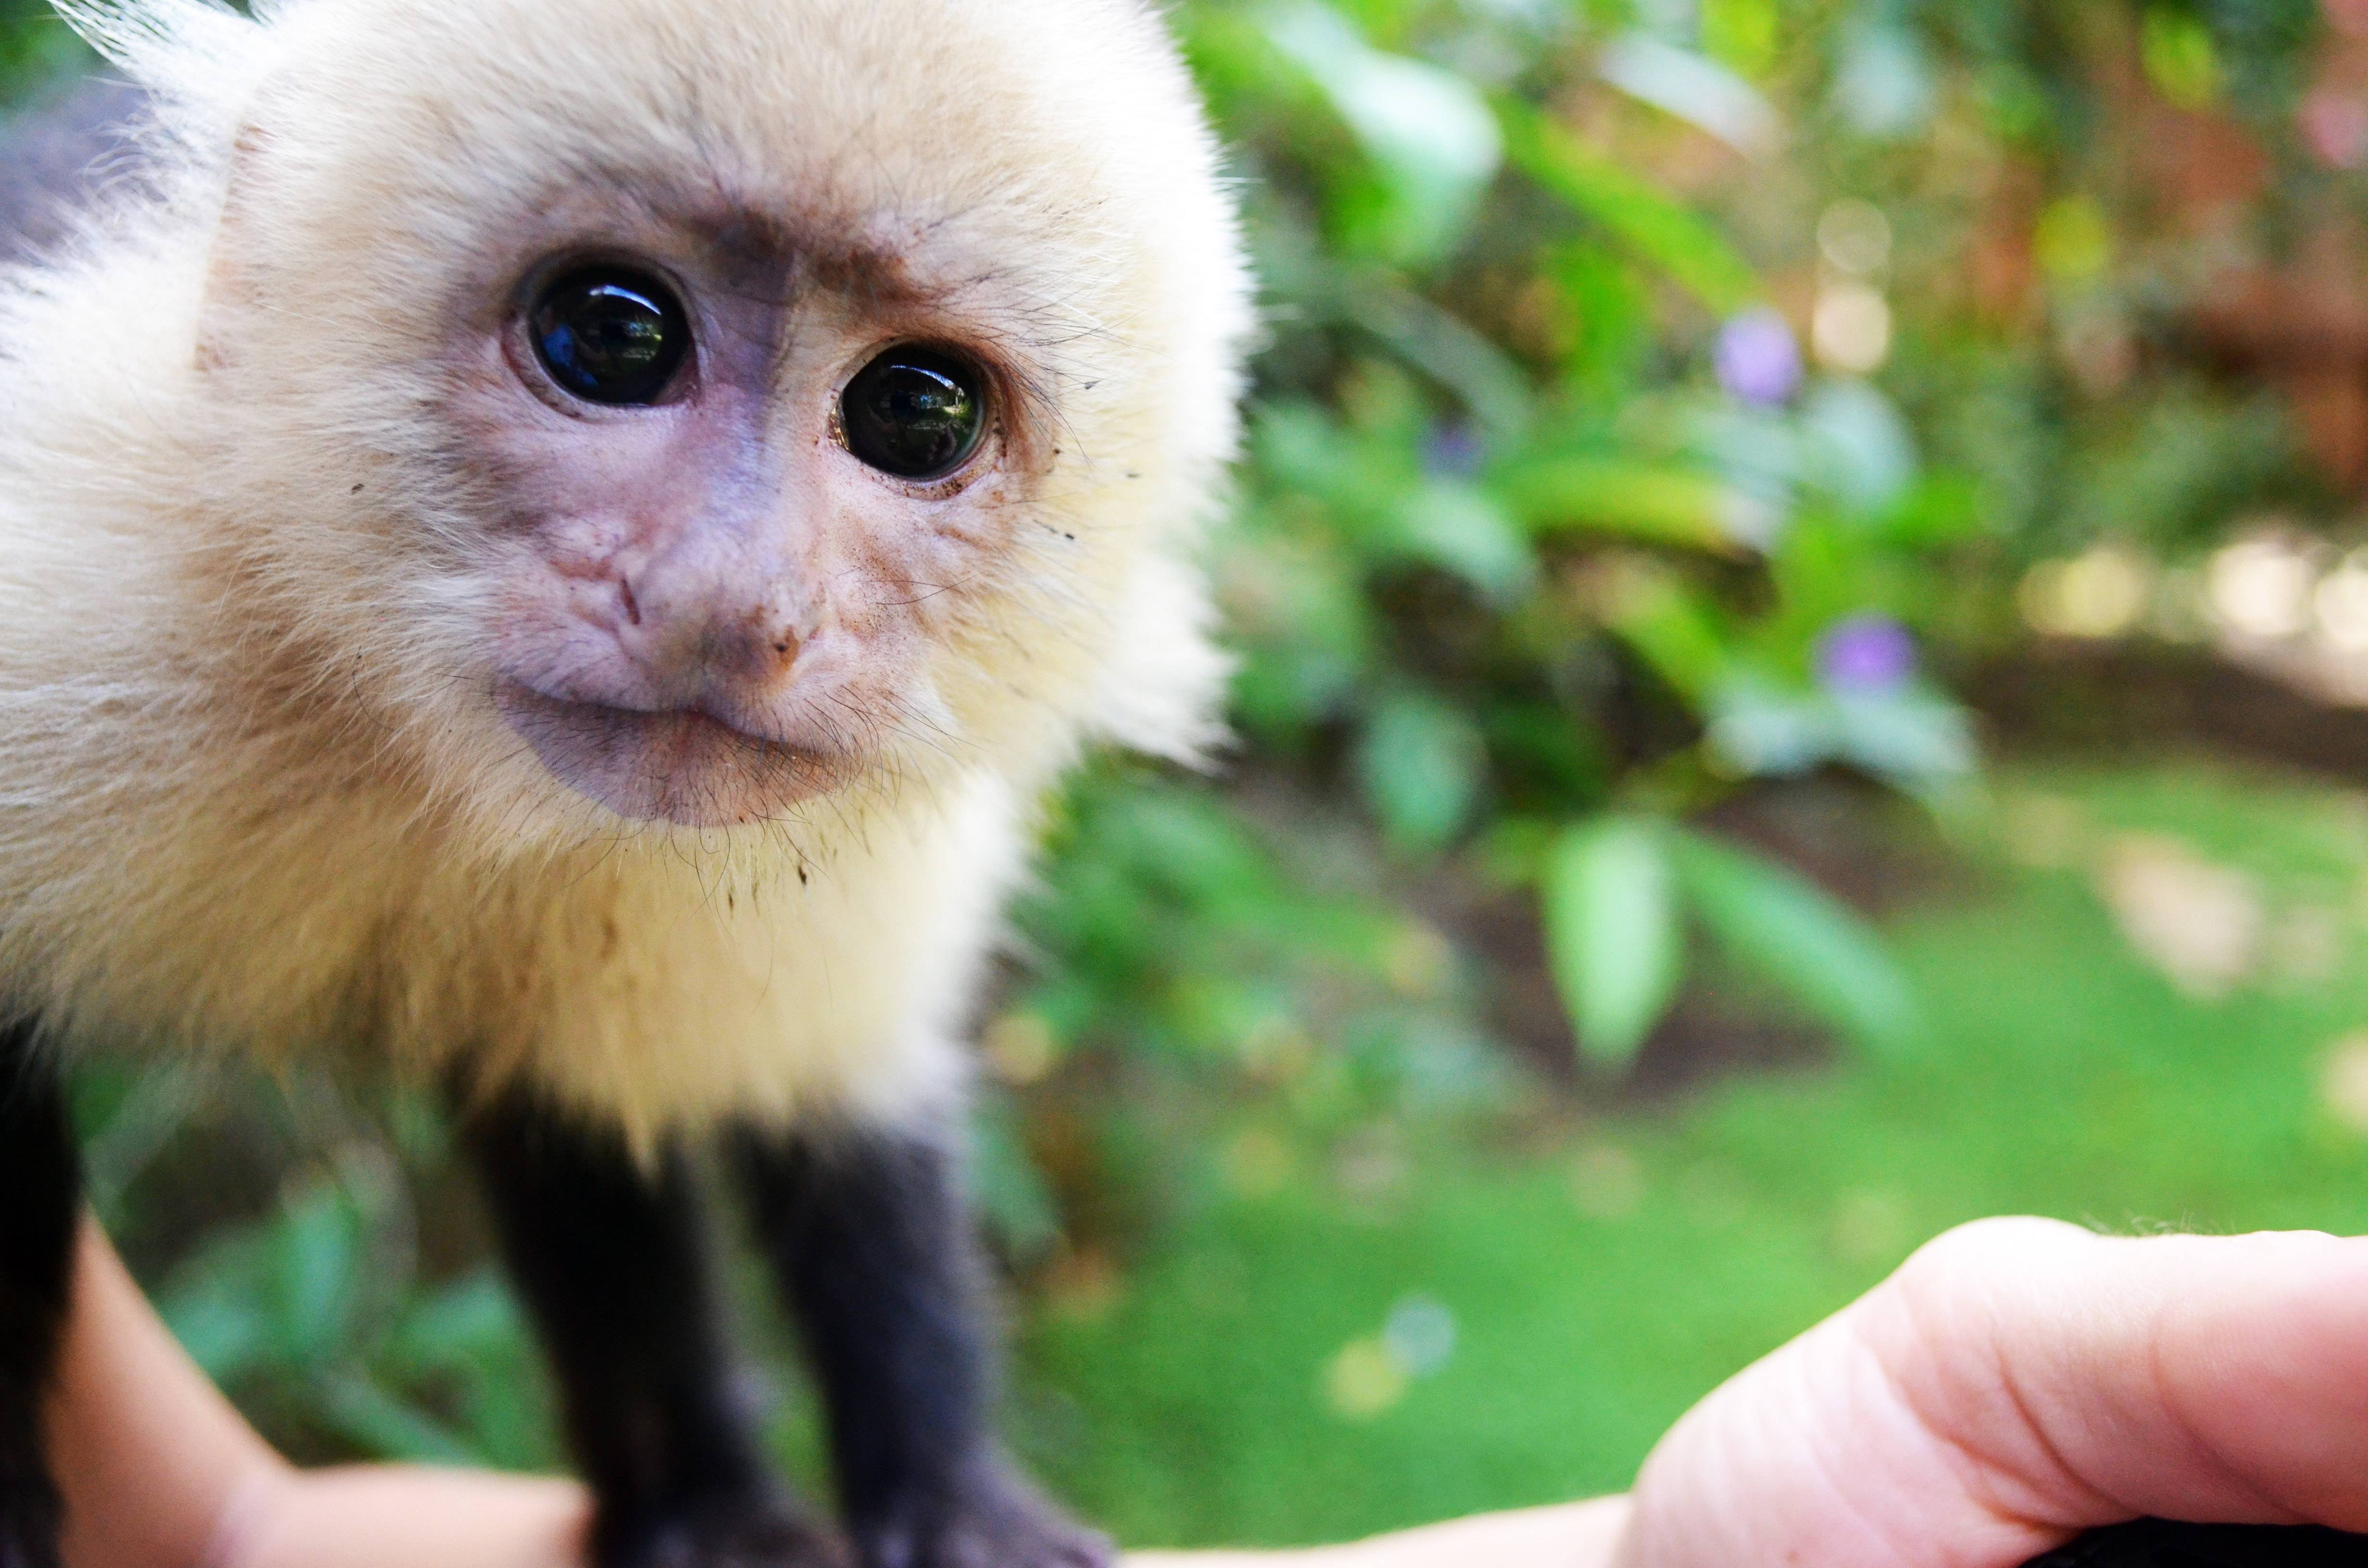 Monos matan a tantas personas en India que autoridades los están esterilizando en masa